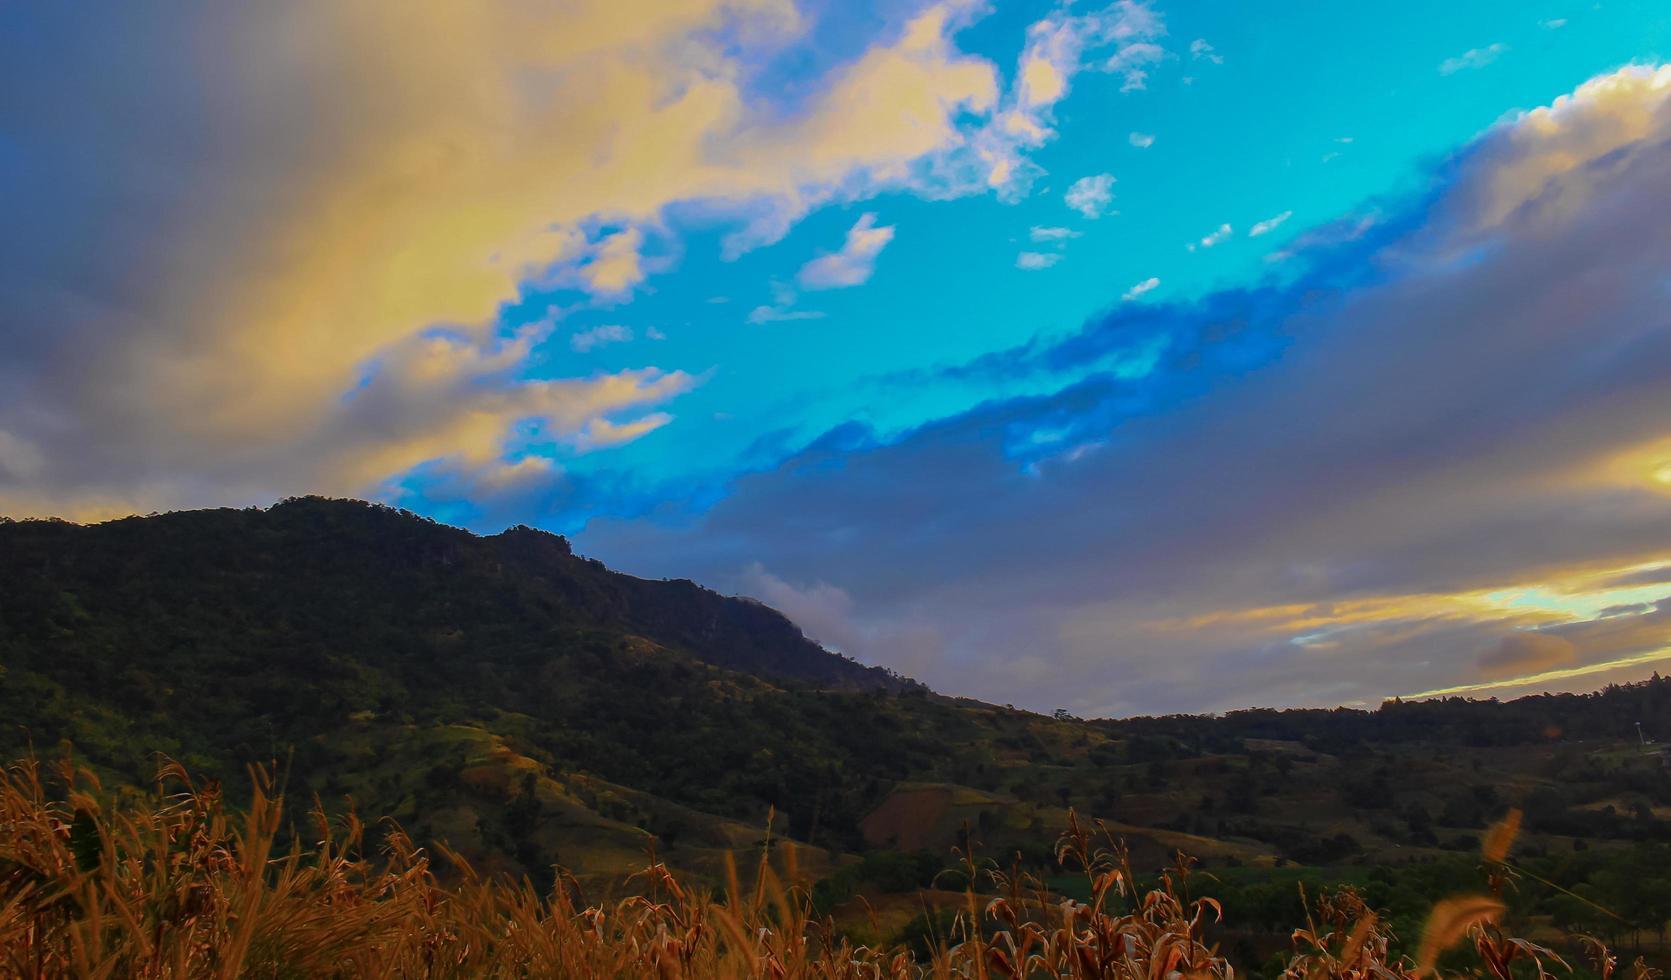 Sonnenaufgang auf dem Land foto